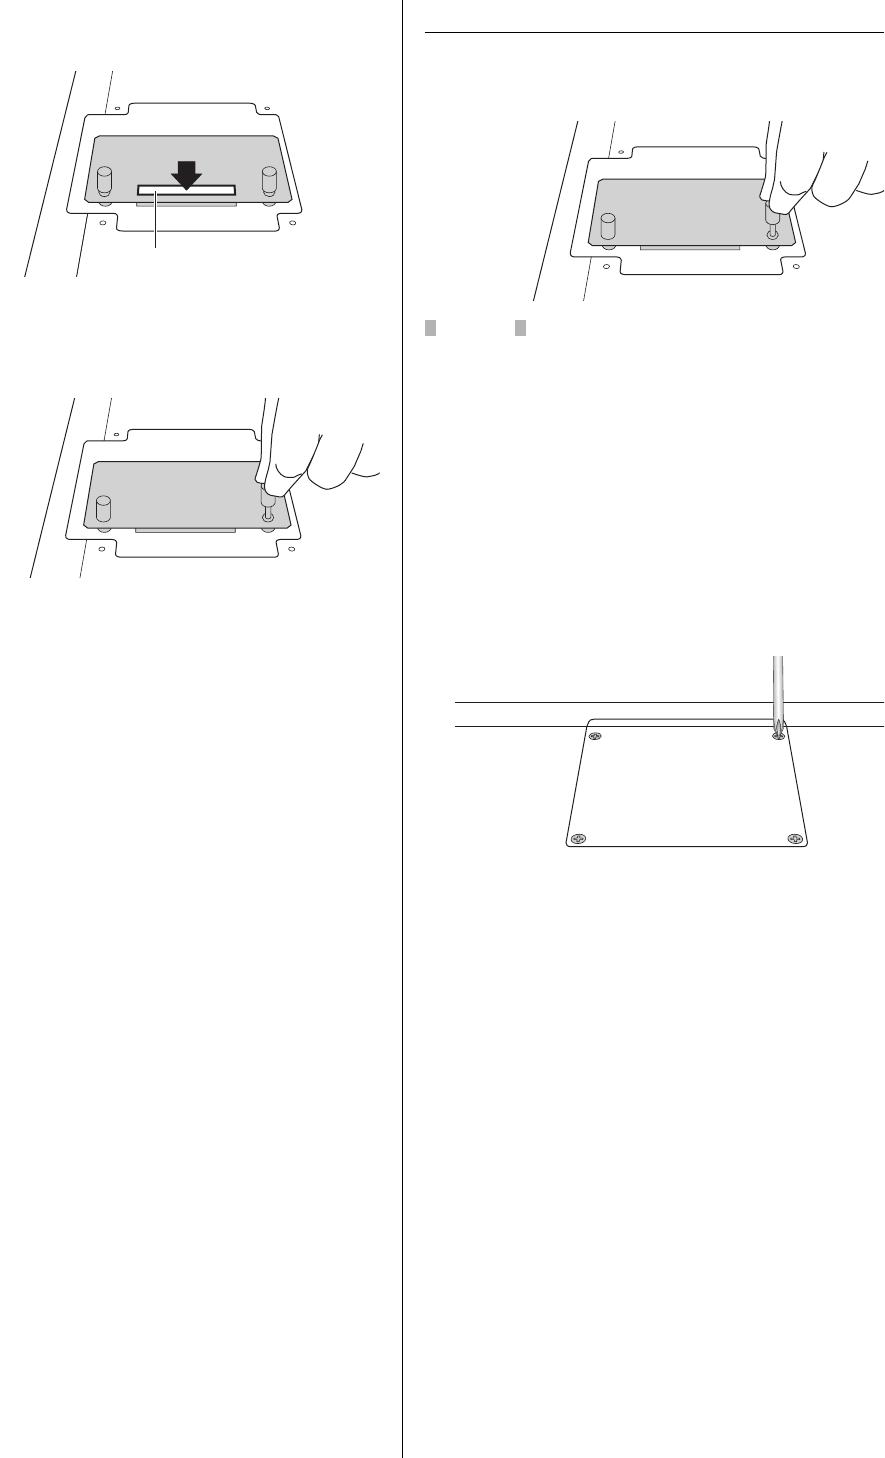 Yamaha MOXF6 / MOXF8 Owner's Manual MOXF6/MOXF8 Owner's